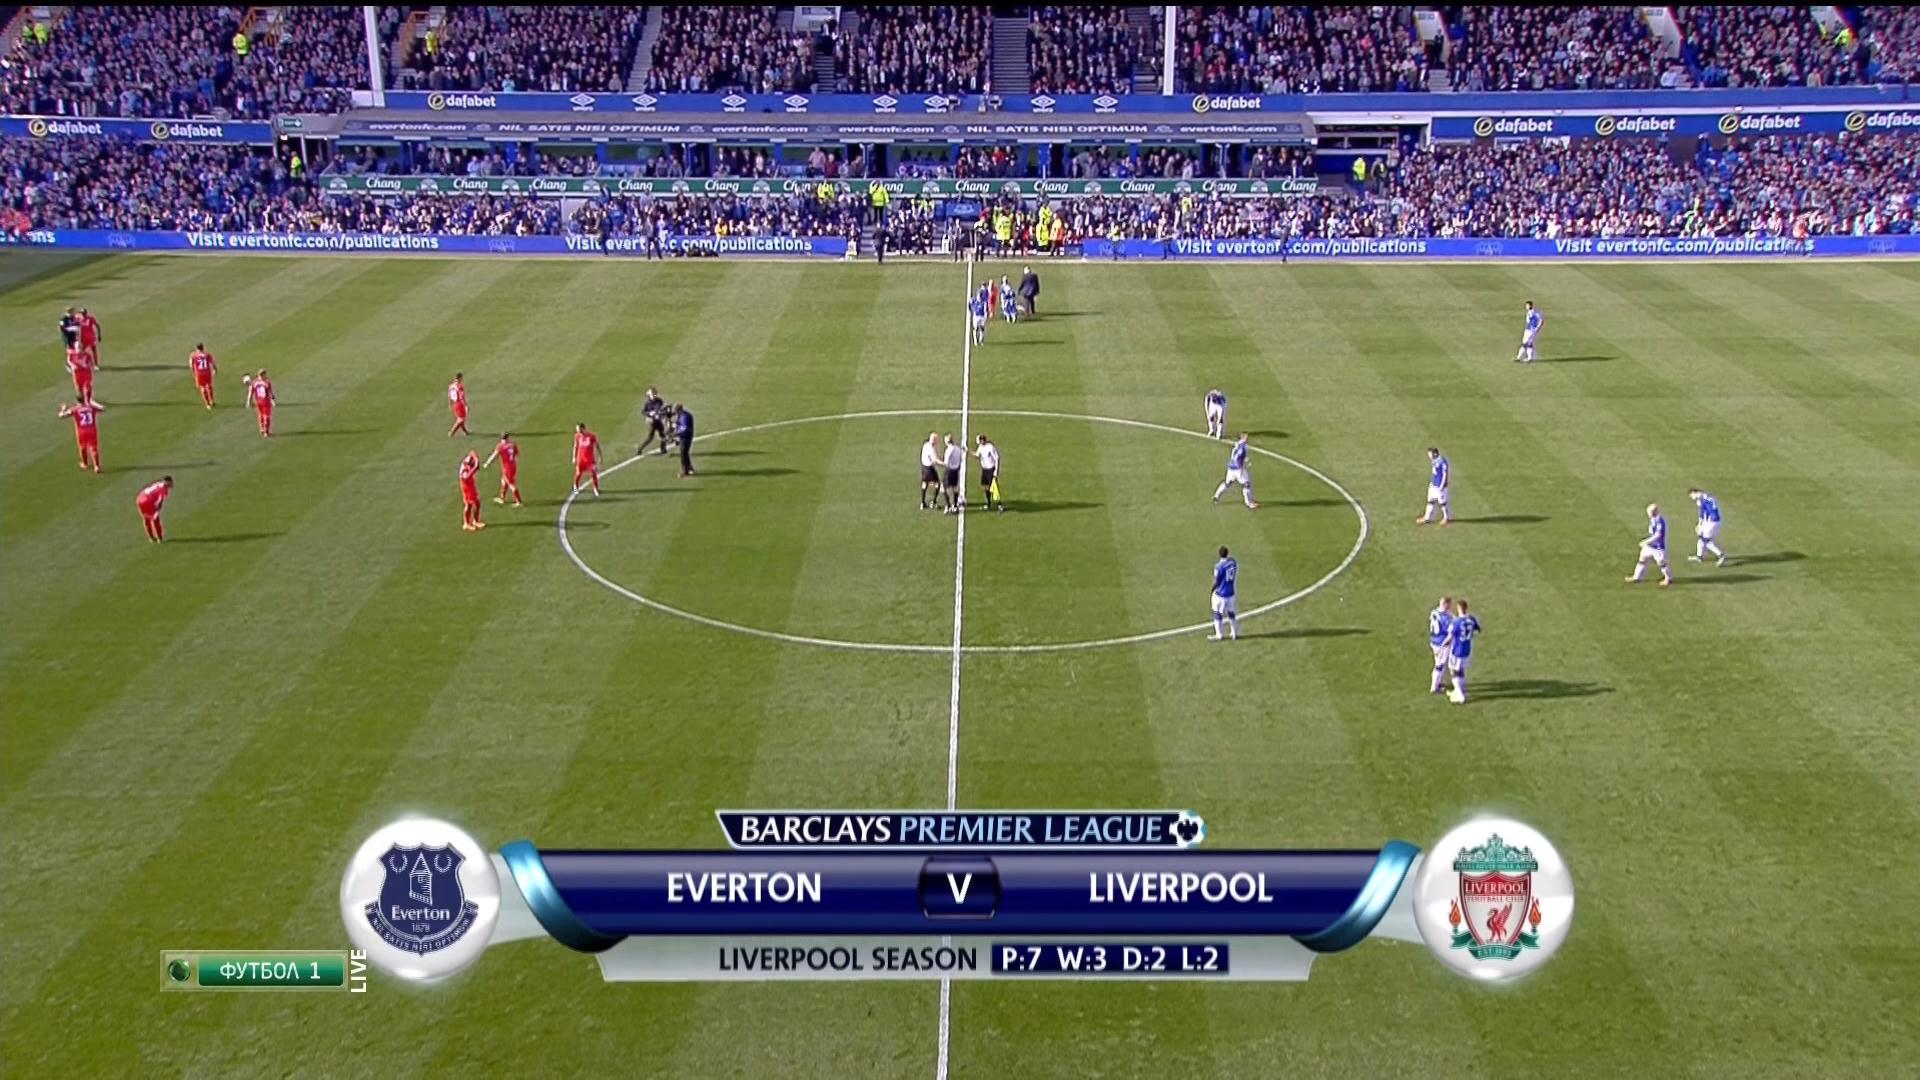 Футбол англия на нтв эвертон